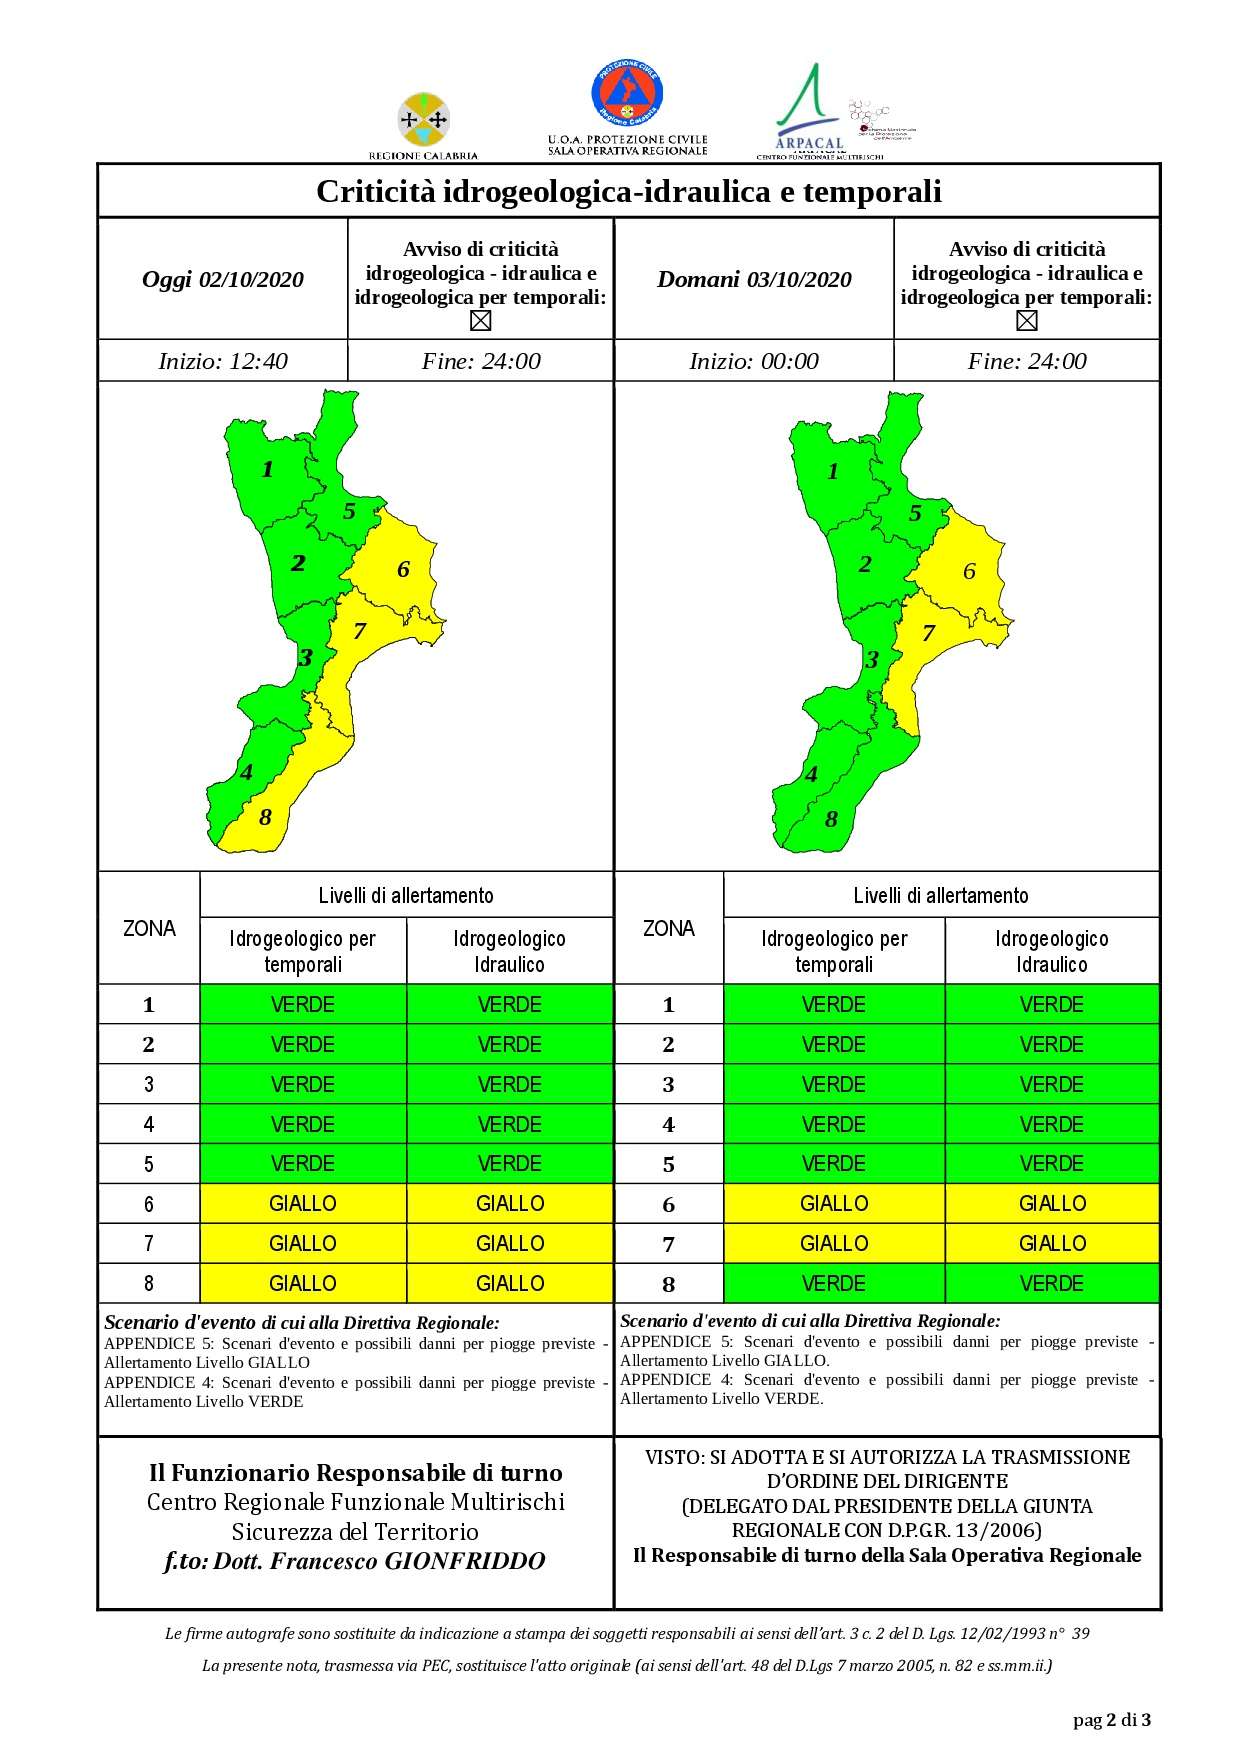 Criticità idrogeologica-idraulica e temporali in Calabria 02-10-2020